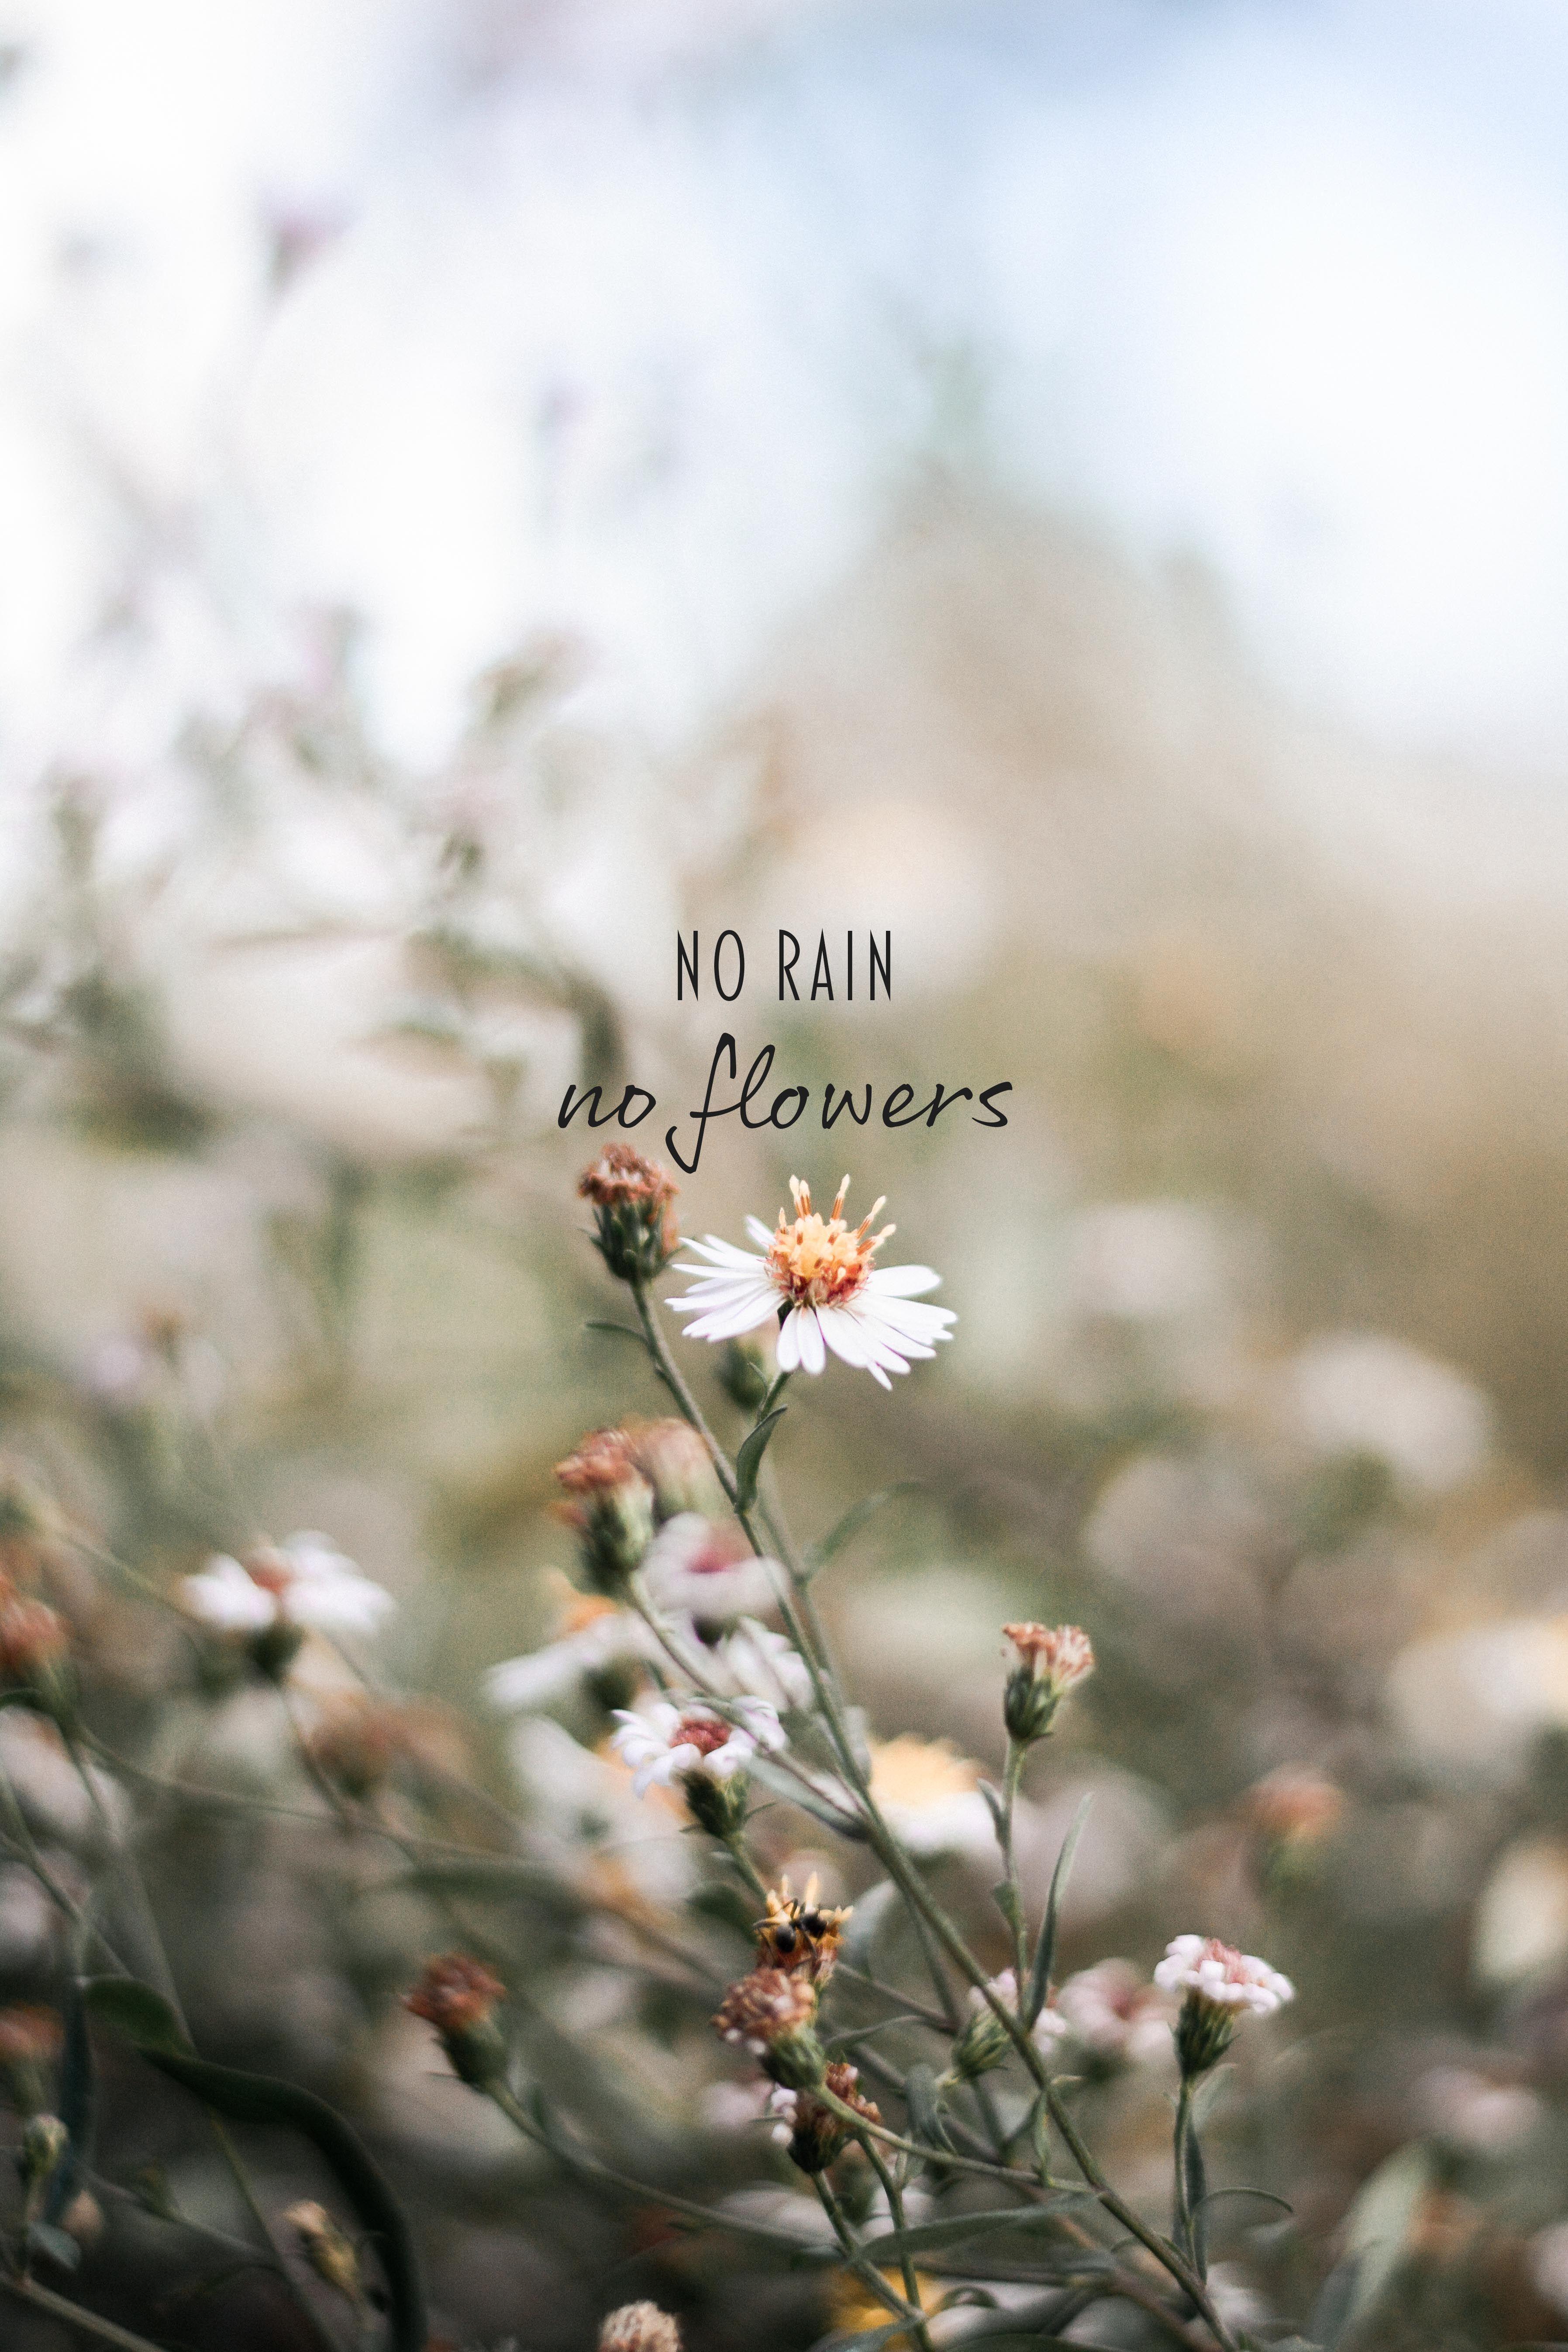 No Rain No Flowers Quotes Motivational Words Inspirational Prints Wallpaper Background Ins No Rain No Flowers Flower Quotes Flower Background Wallpaper